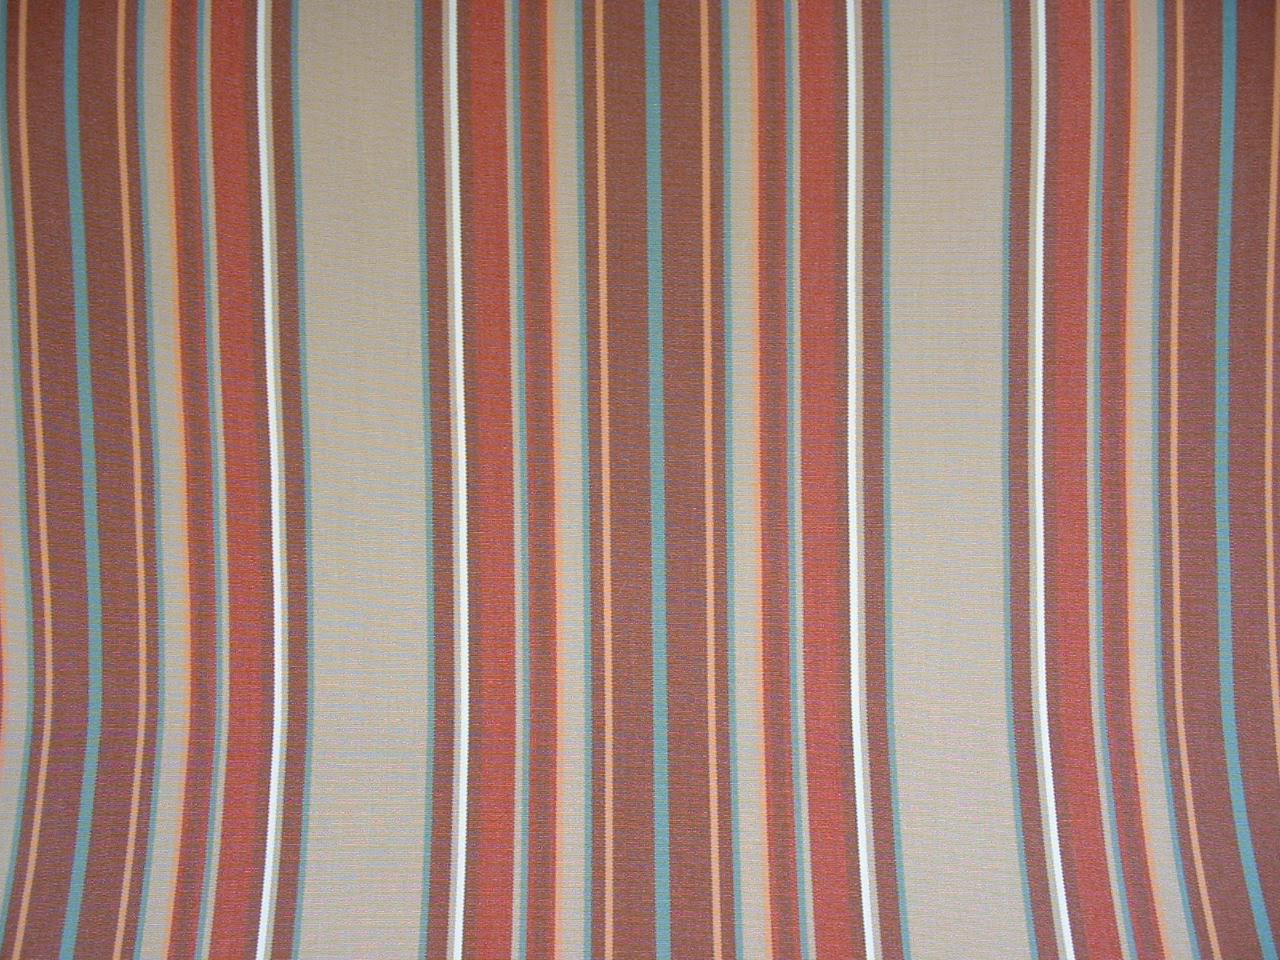 Vintage Trailer Awning 2015 Vintage Trailer Awning Fabric